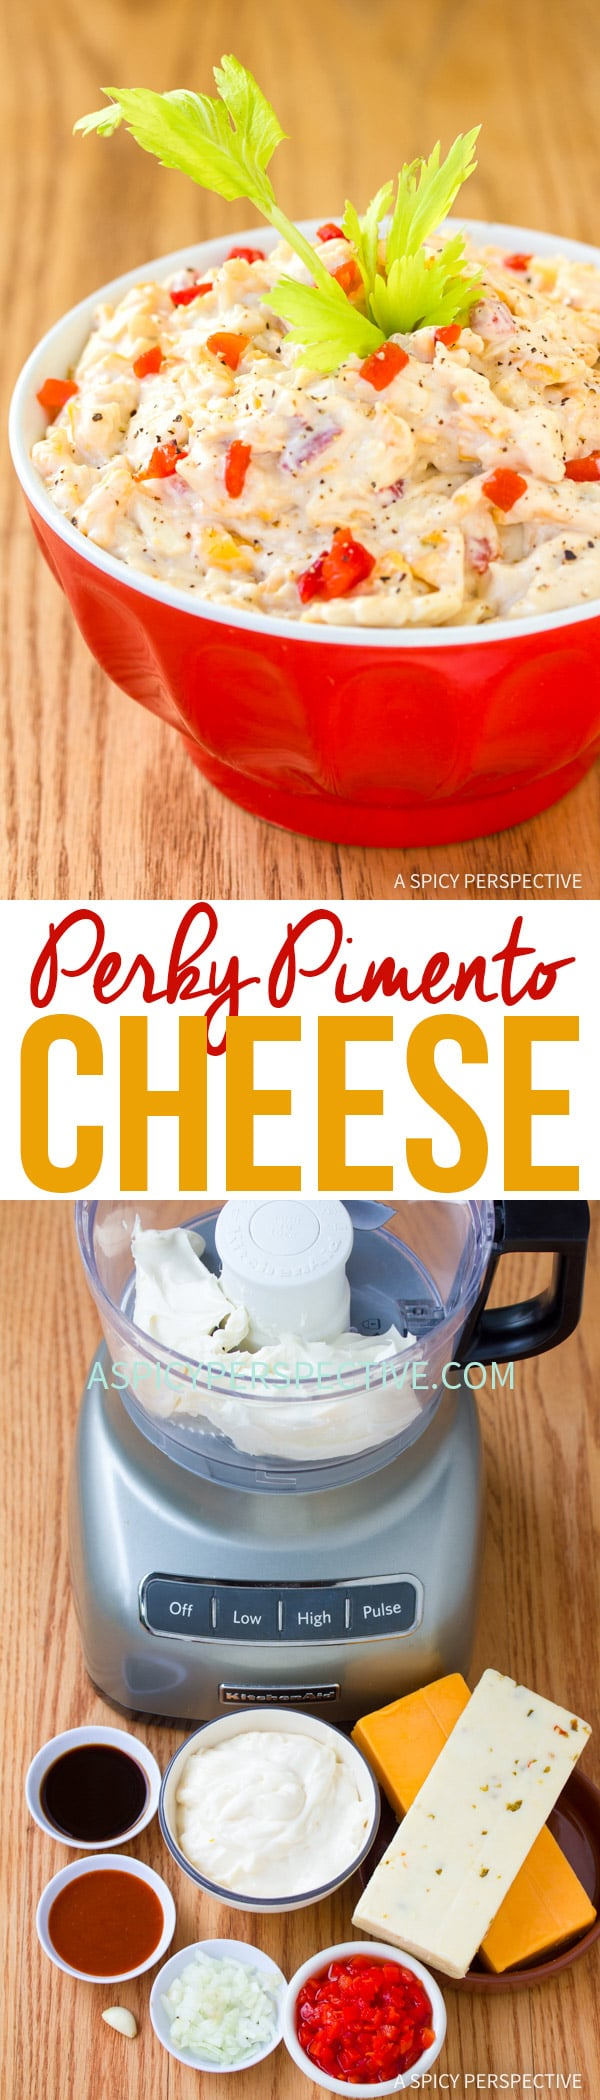 Perky Southern Pimento Cheese Recipe